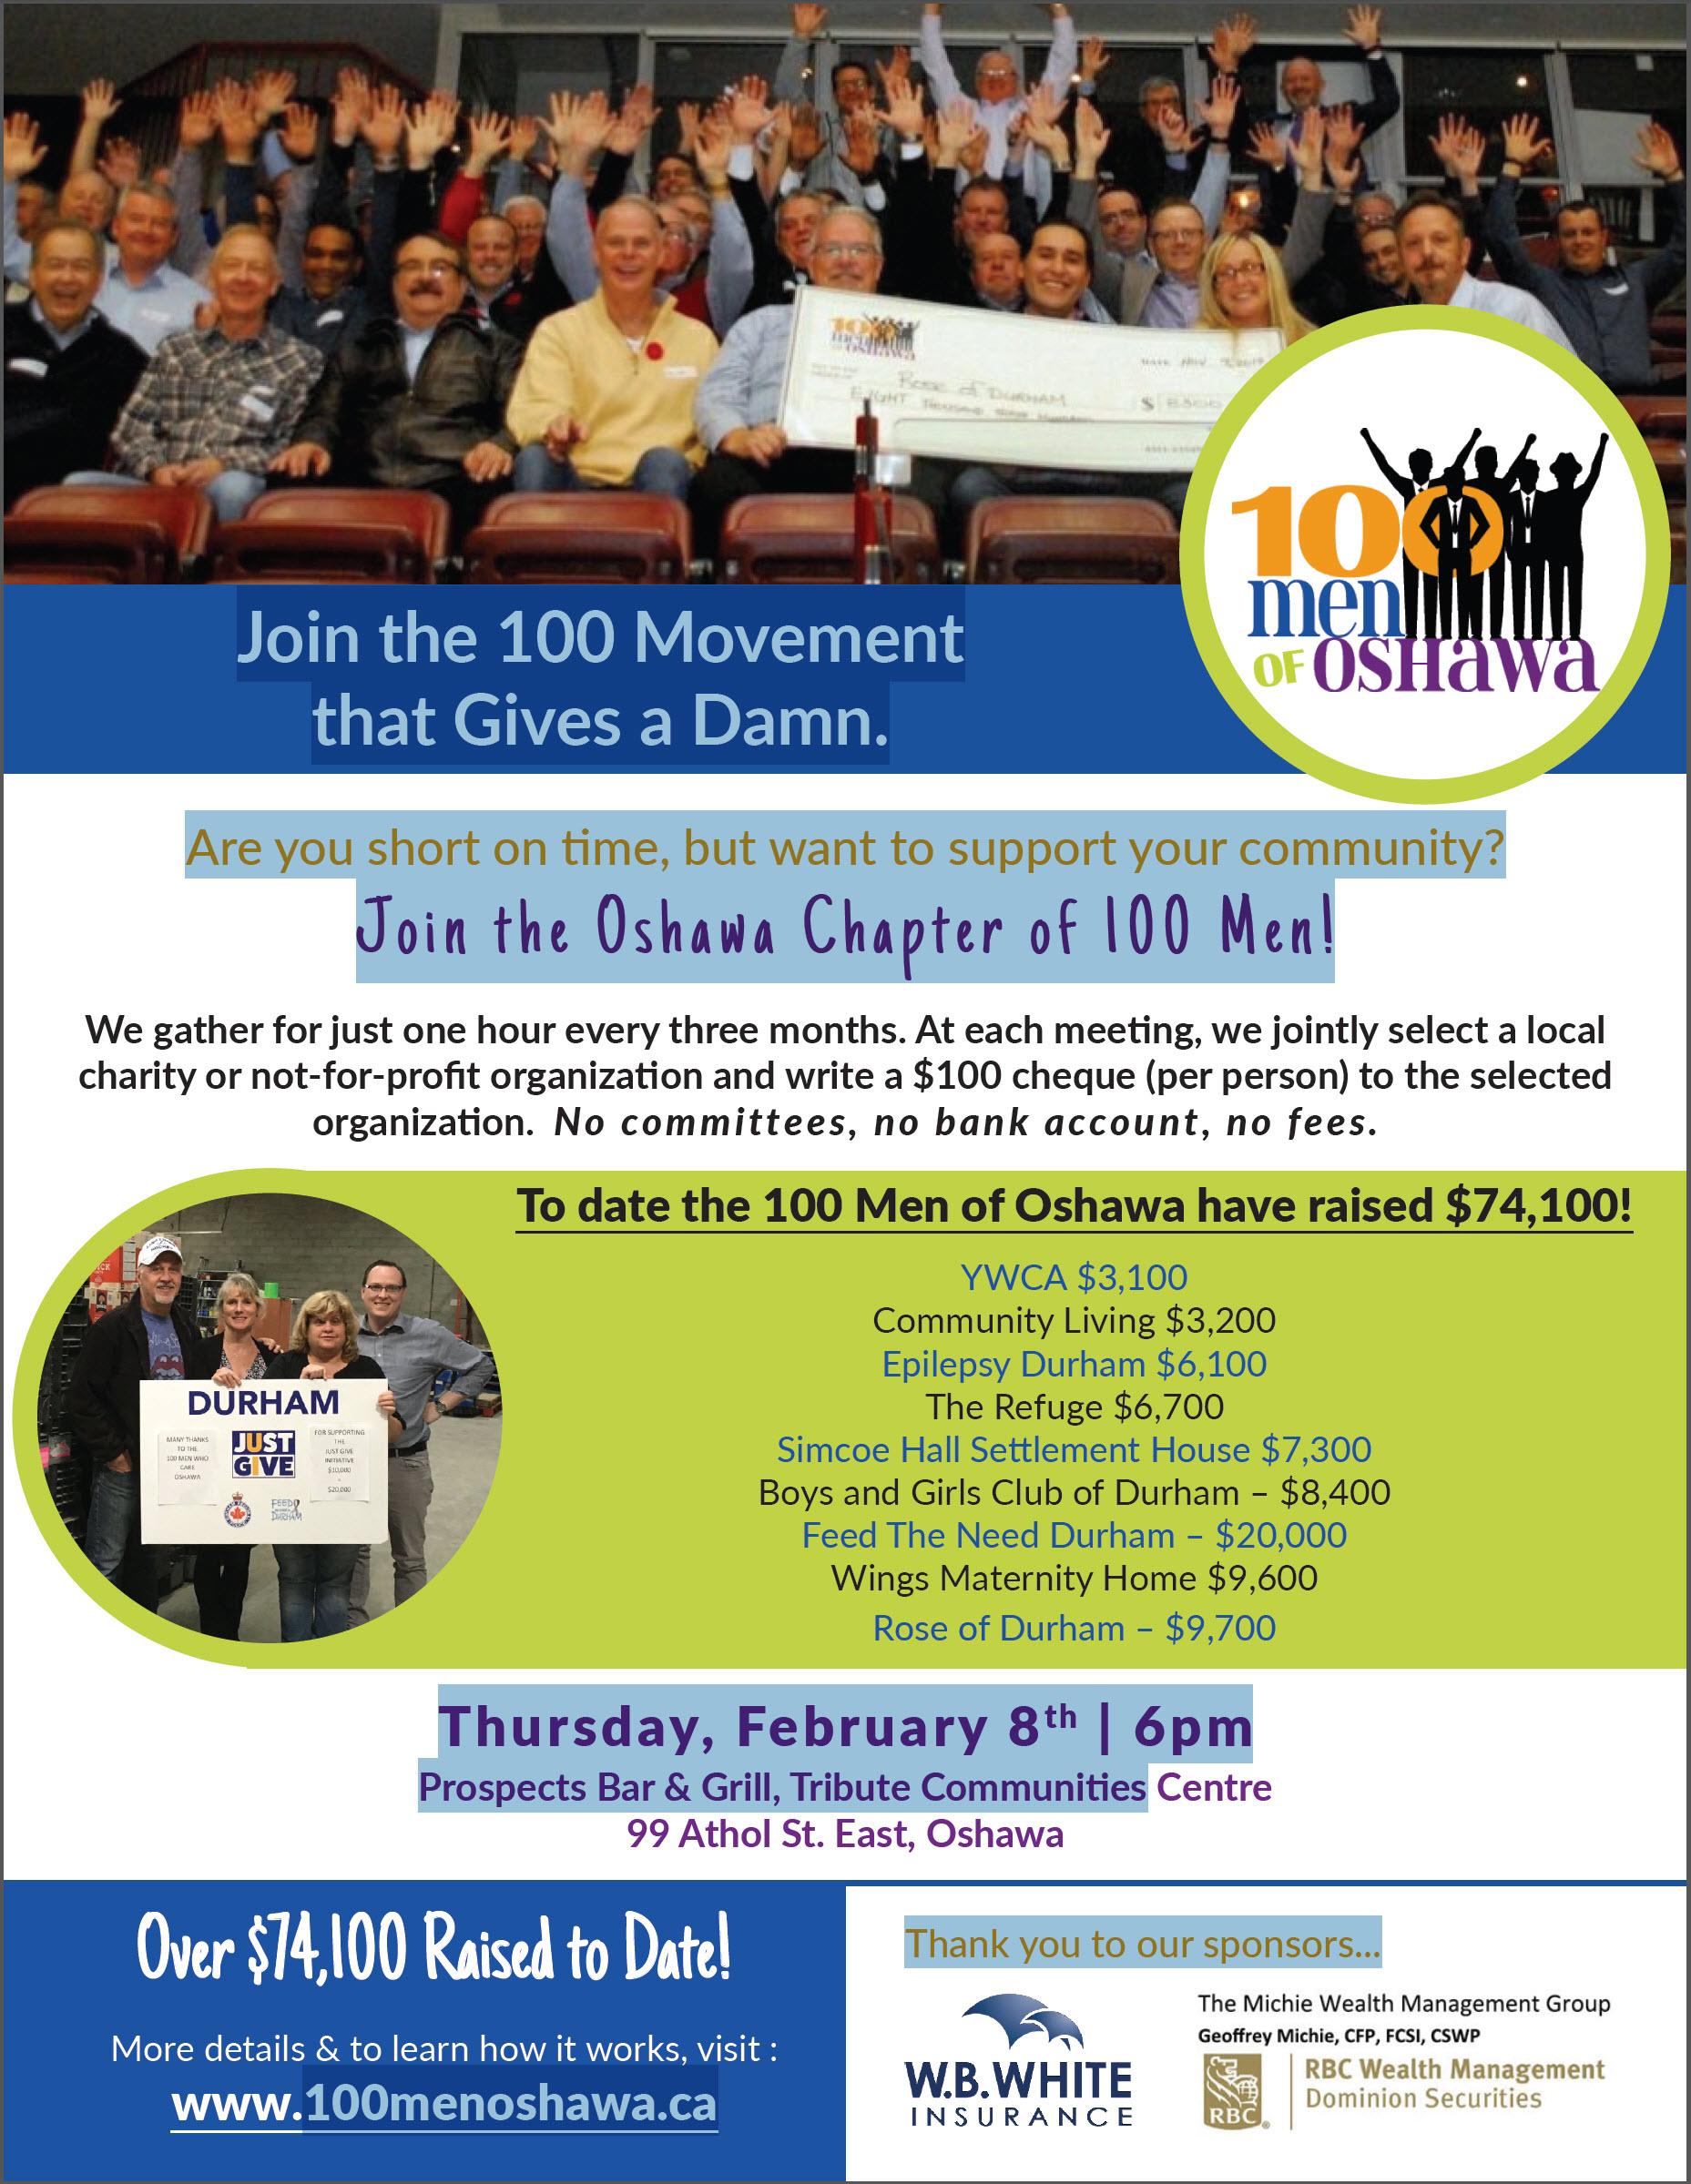 February 8 meeting